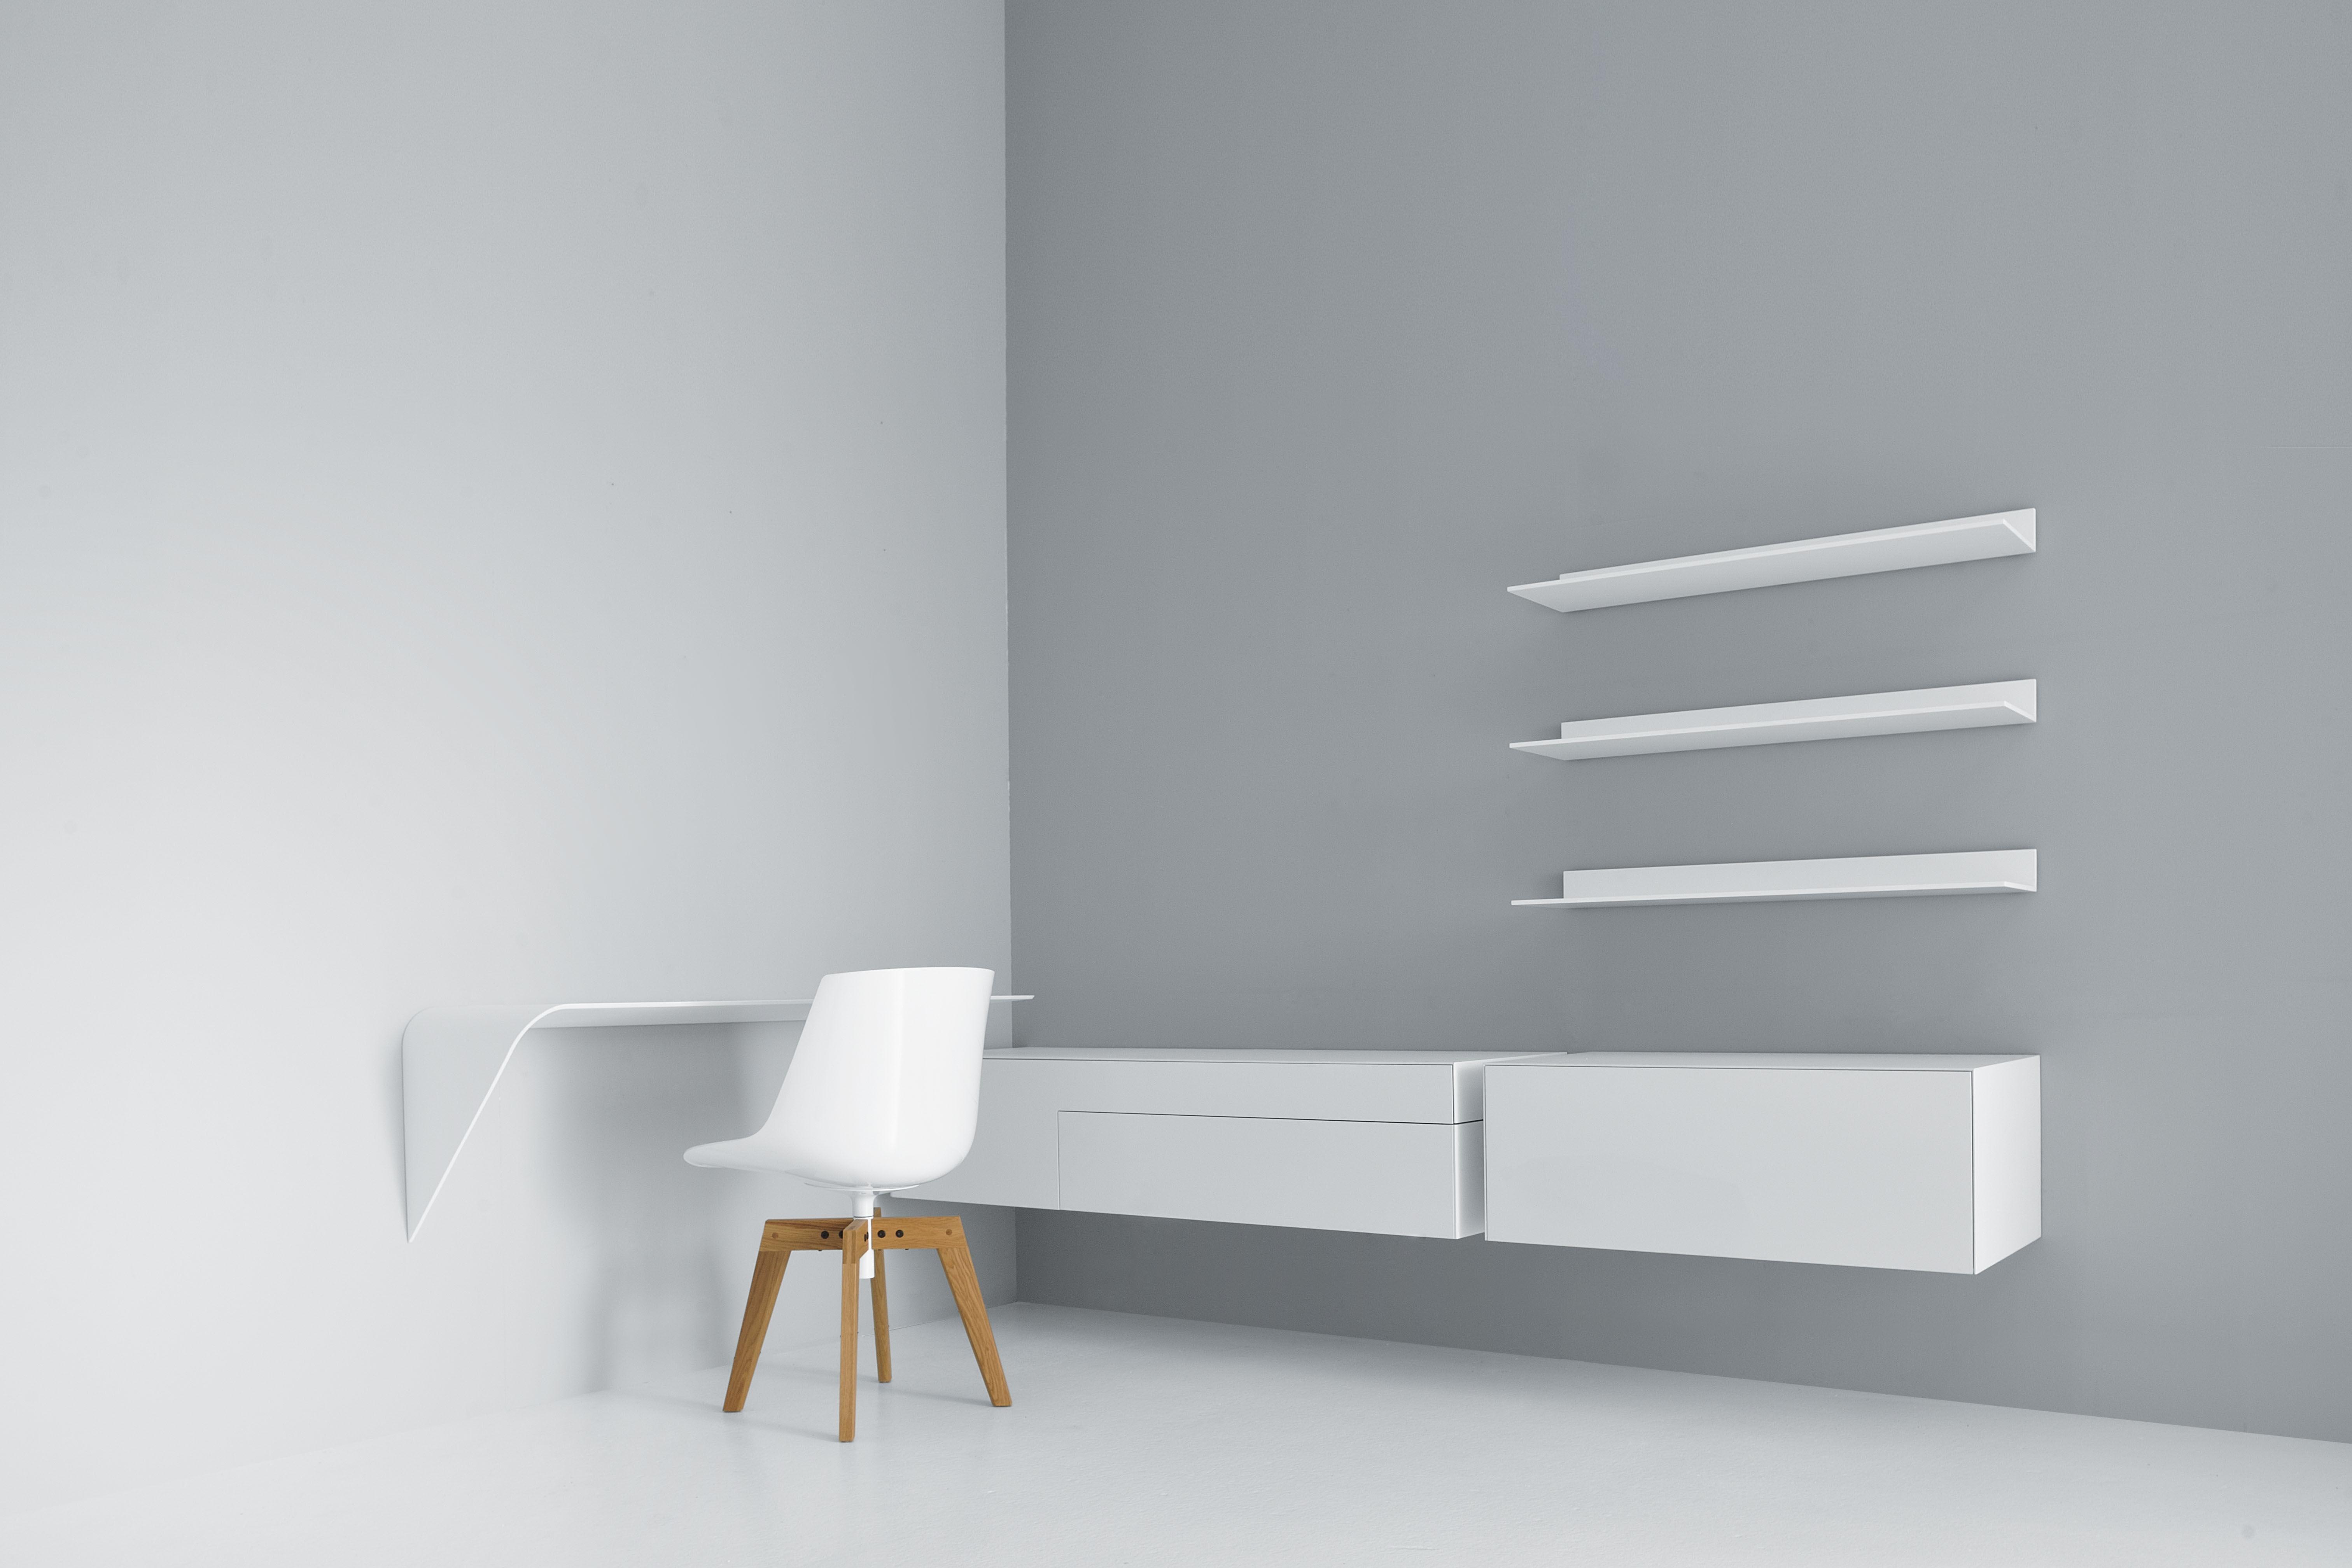 etag re mamba light bureau suspendu angle gauche l 134 x h 44 cm orange mdf italia. Black Bedroom Furniture Sets. Home Design Ideas